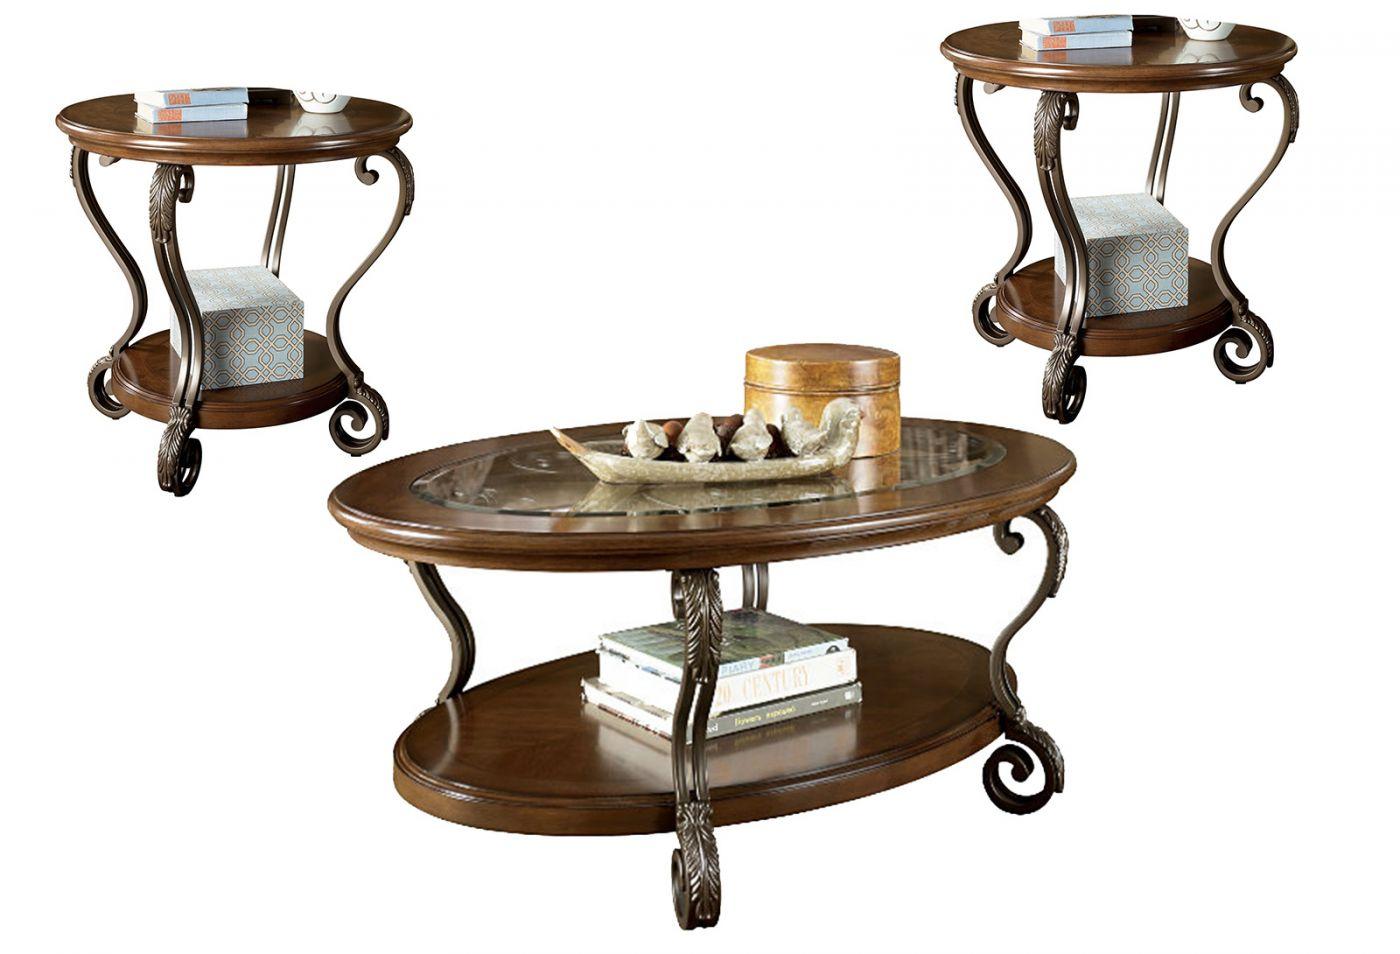 Nestor Coffee Table Hipenmoedernl regarding sizing 1400 X 954